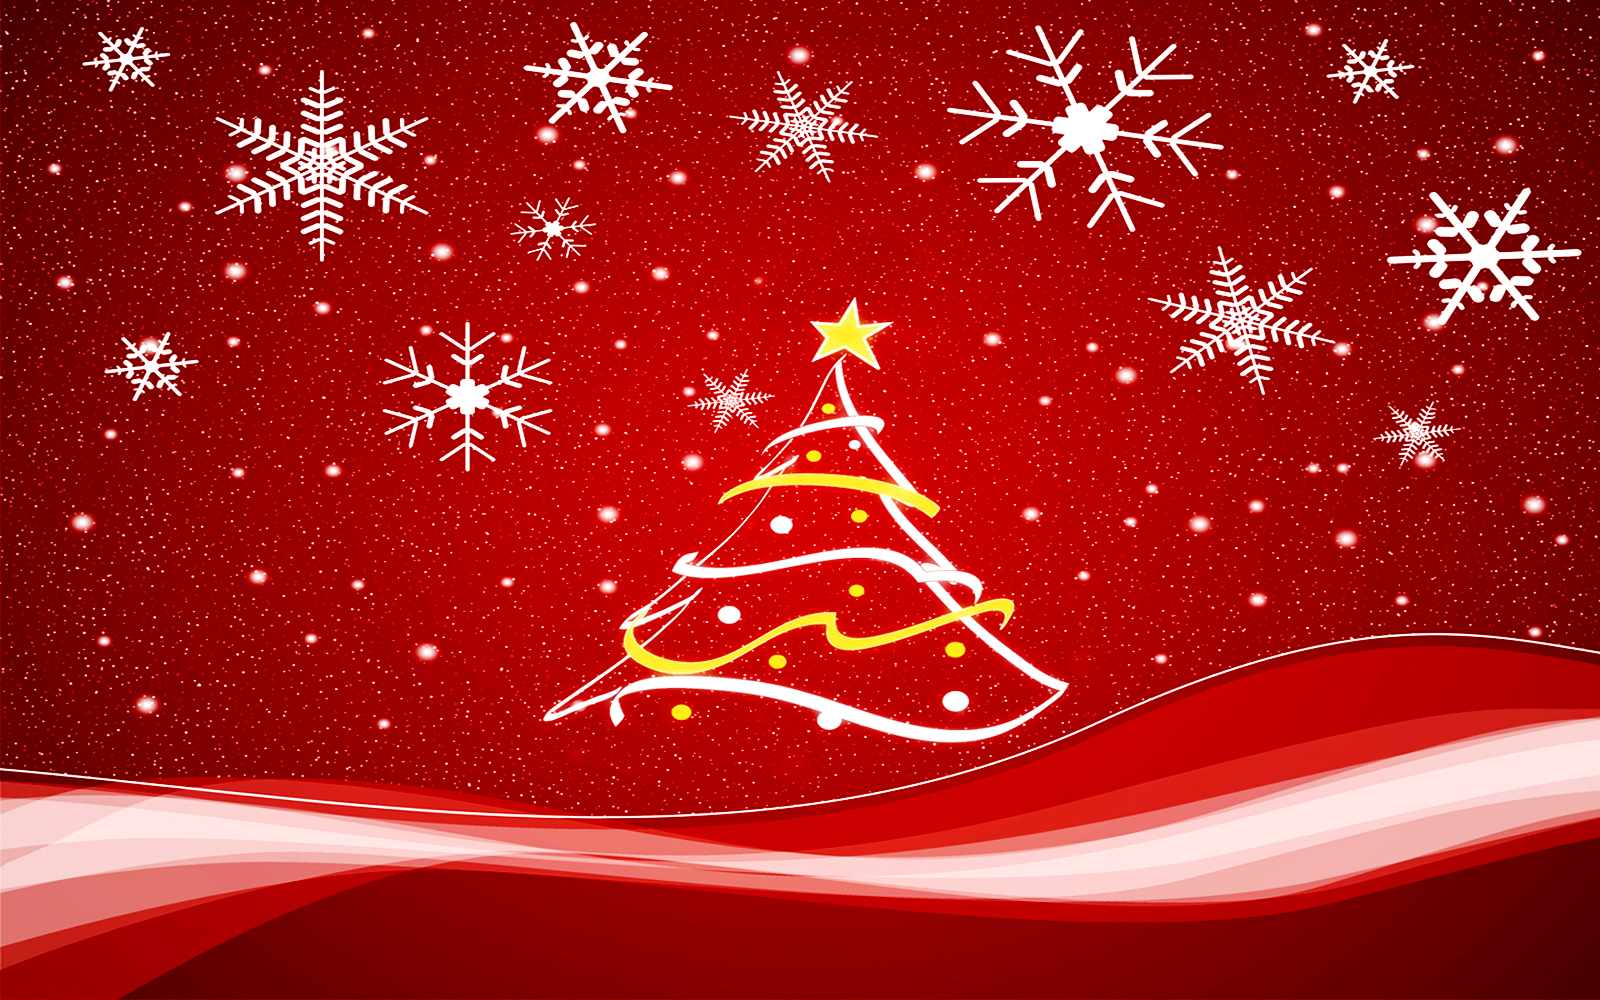 Christmas Tree Vector HD Wallpaper